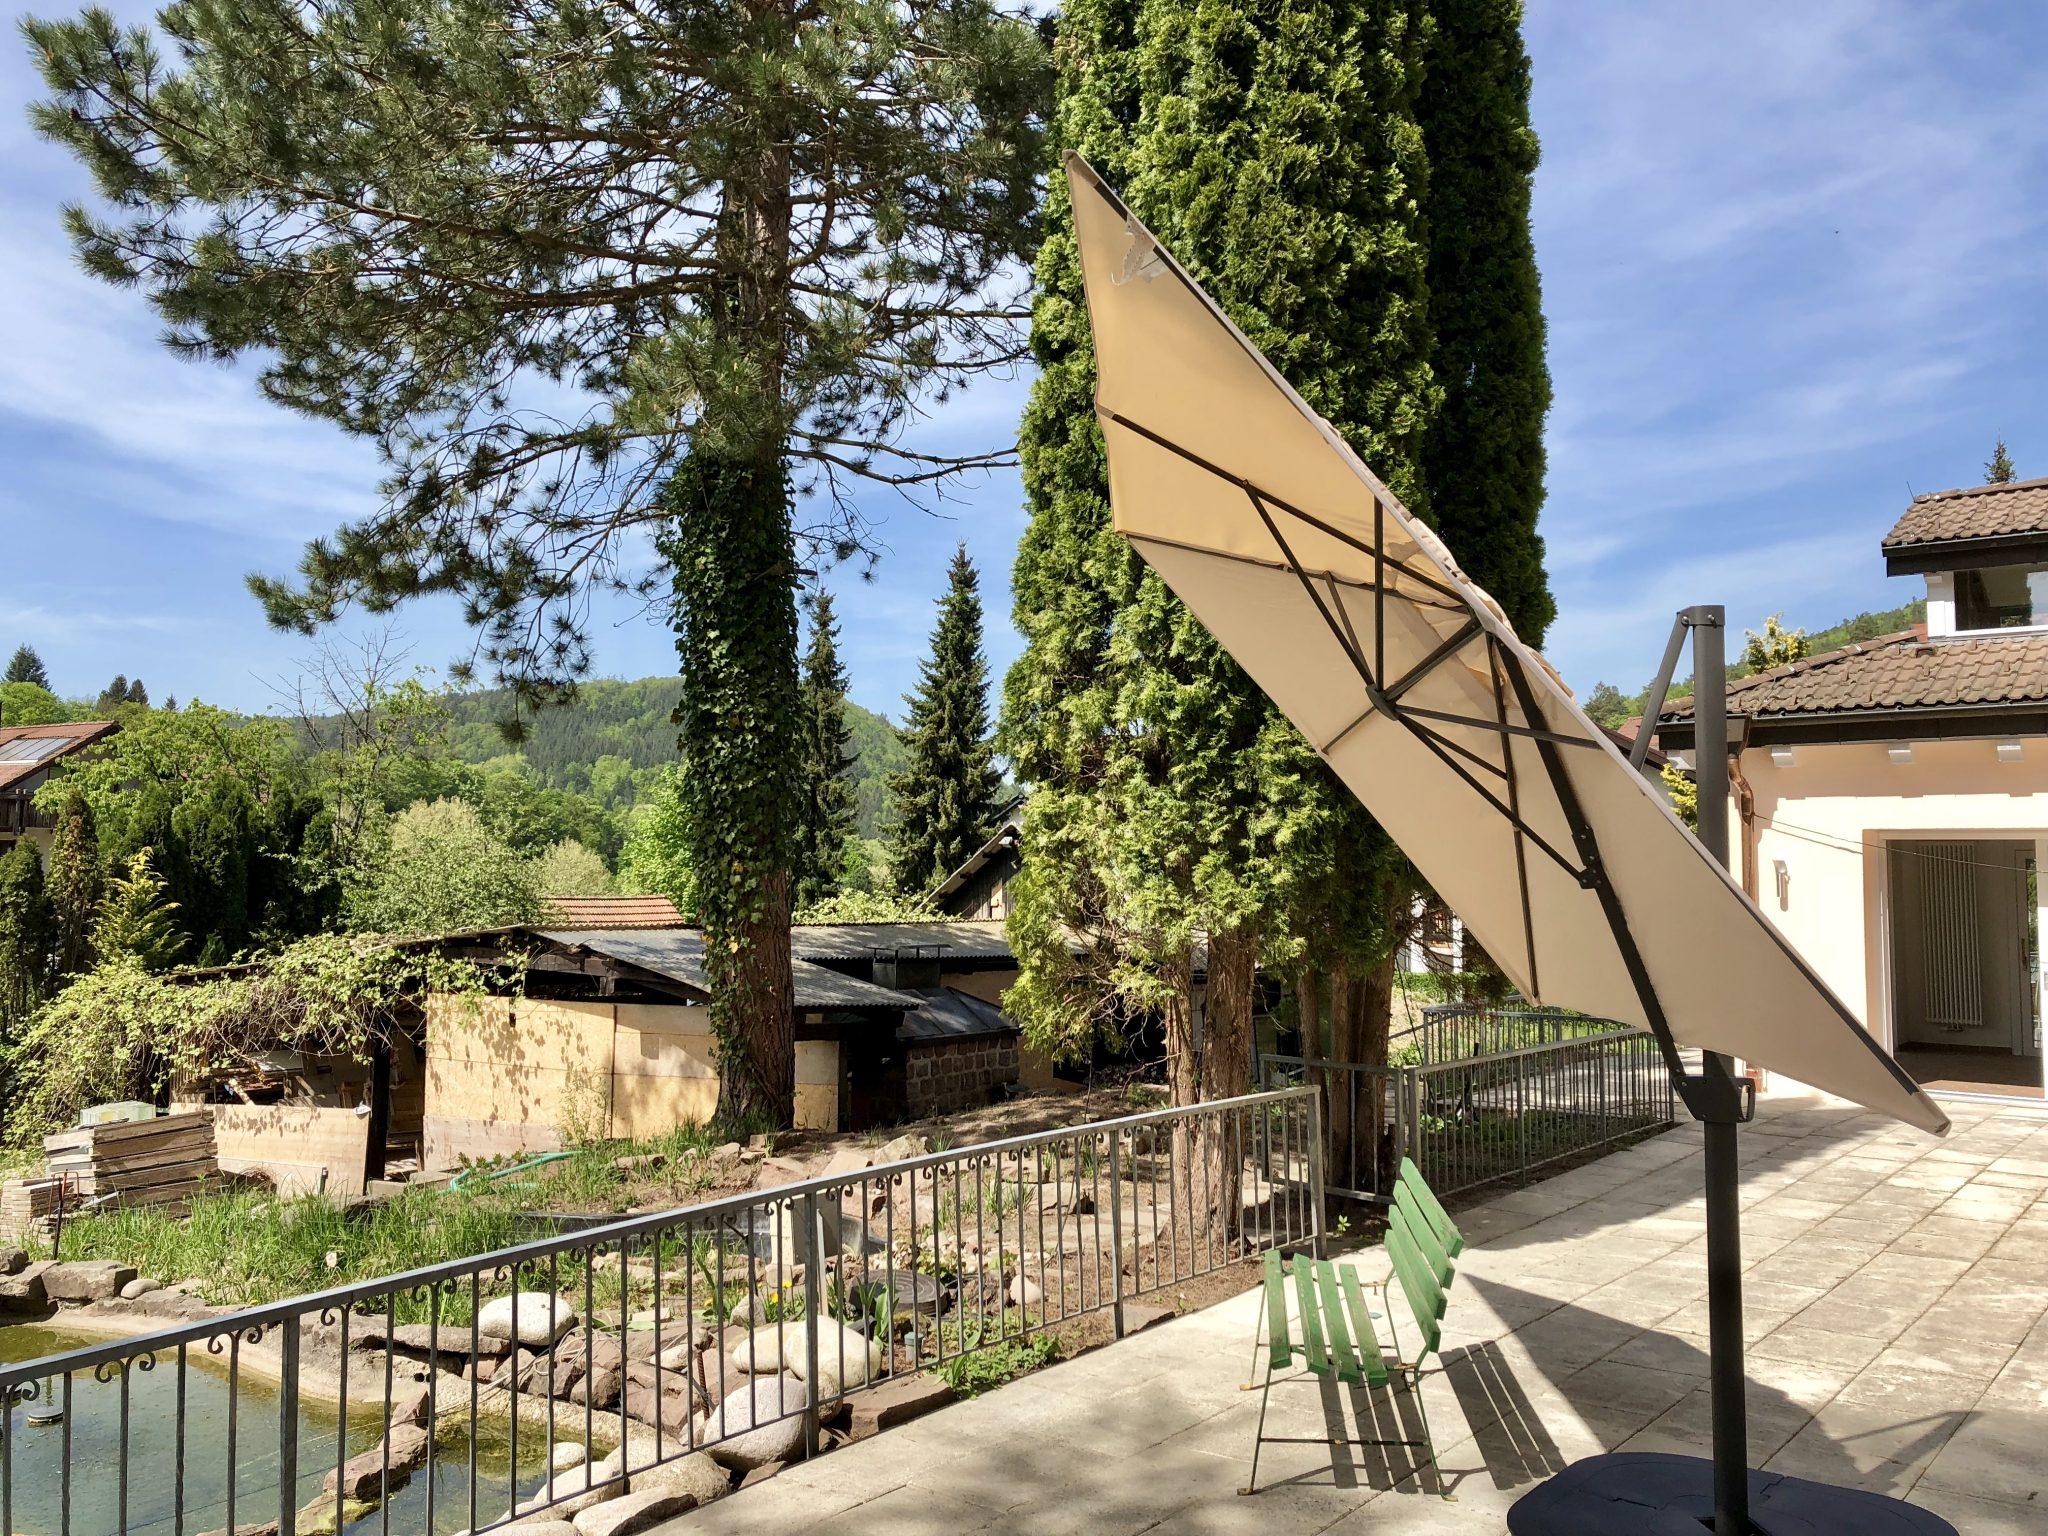 Sonnenschirm Garten Albtal-Residenz